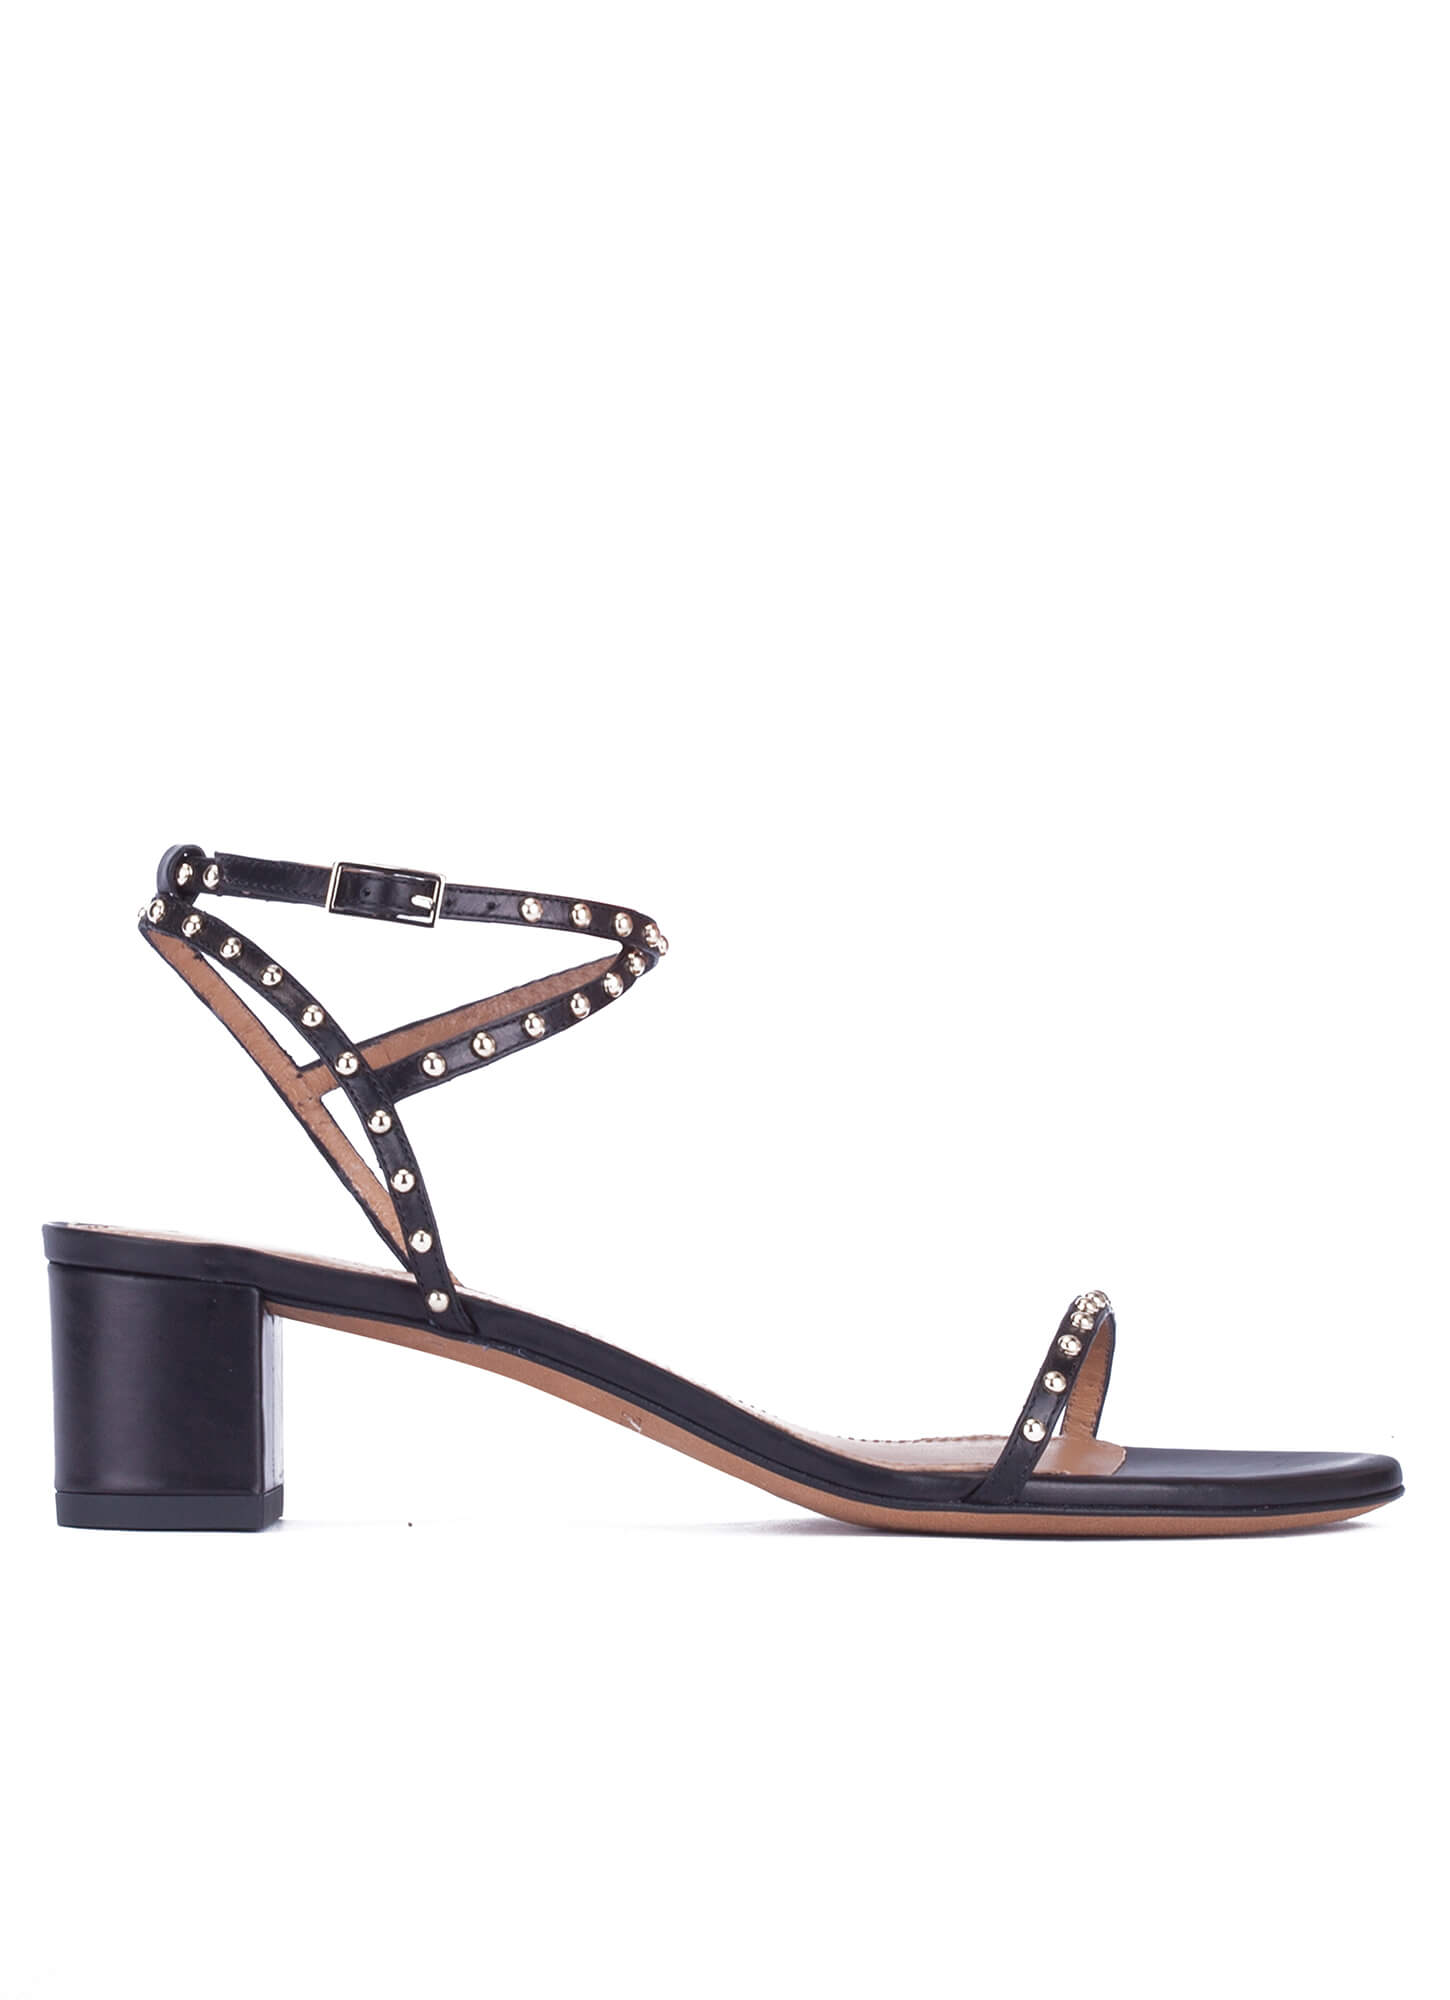 43a32802d Olmeneta sandals Pura López. Studded mid block heel sandals in black leather  ...